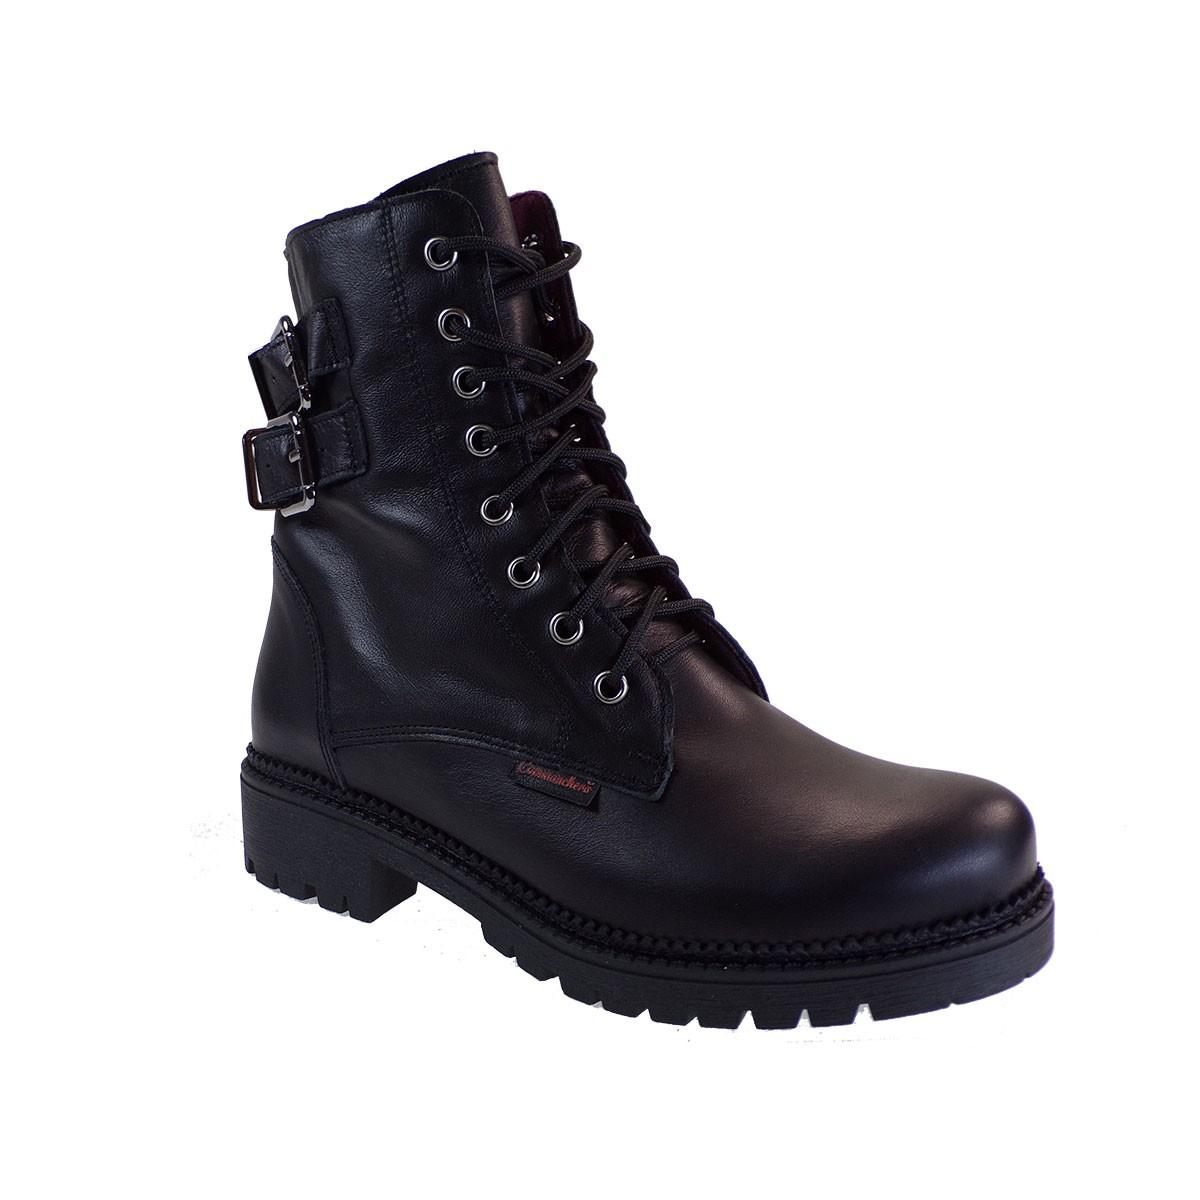 Commanchero Γυναικεία Παπούτσια Μποτάκια Αρβυλάκια 5776-721 Μαύρο Δέρμα